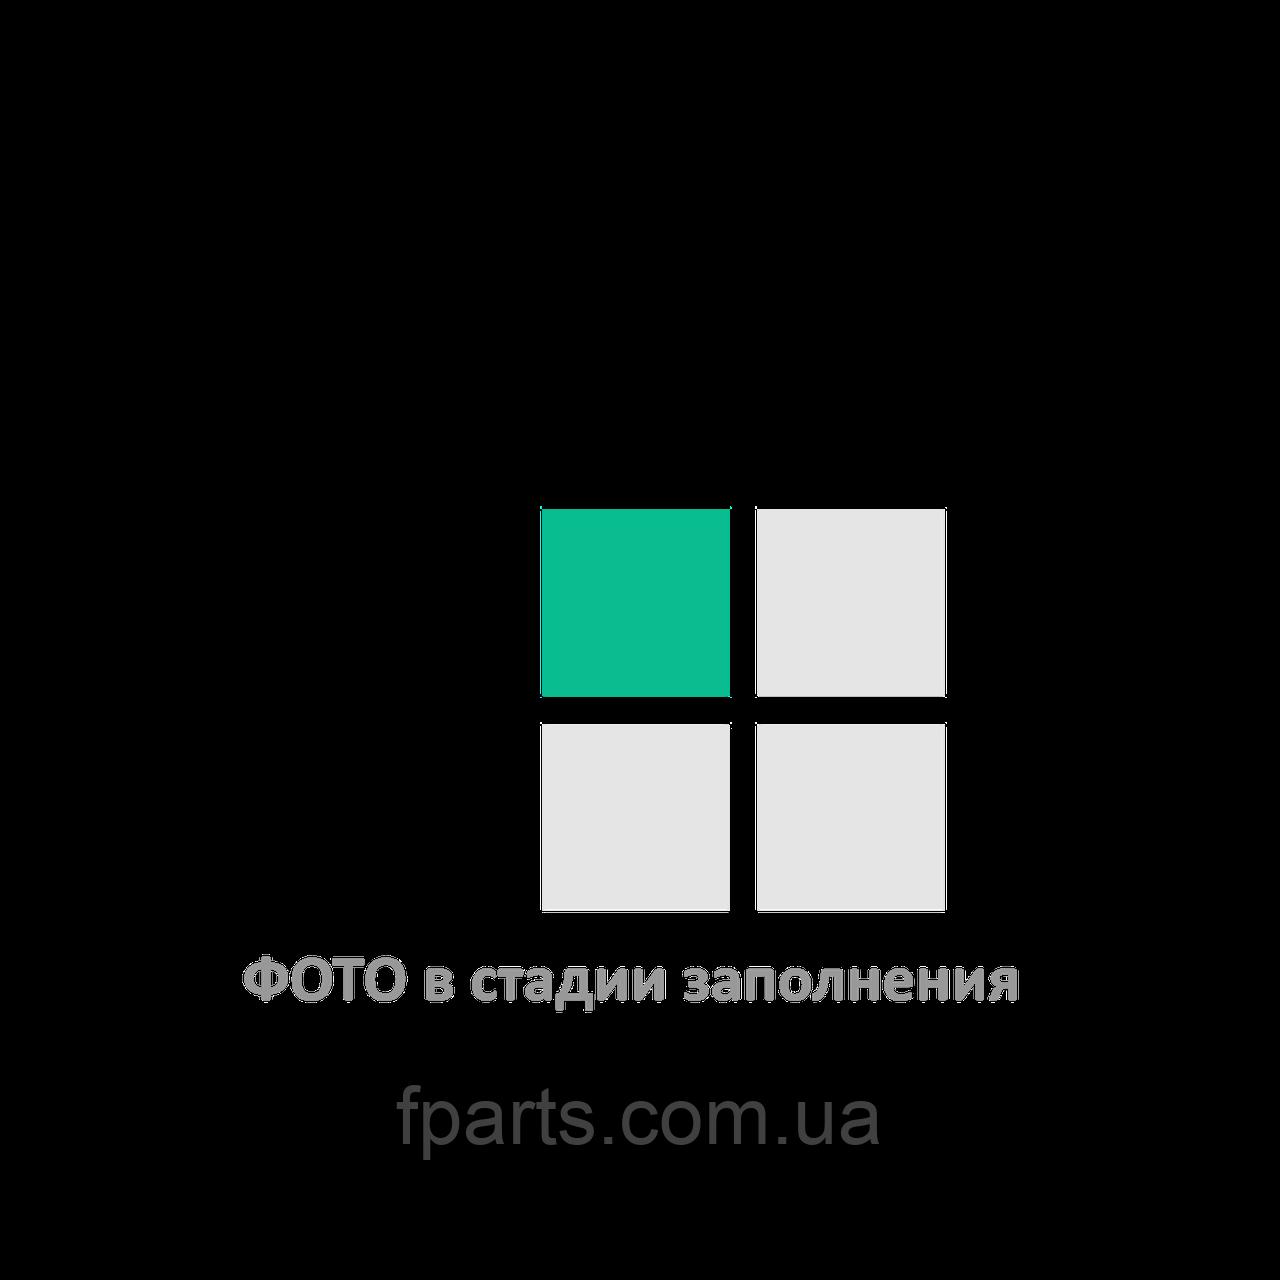 Дисплей Asus ZenFone 2 (ZE551ML AUO FHD, Z00AD) , с тачскрином Original